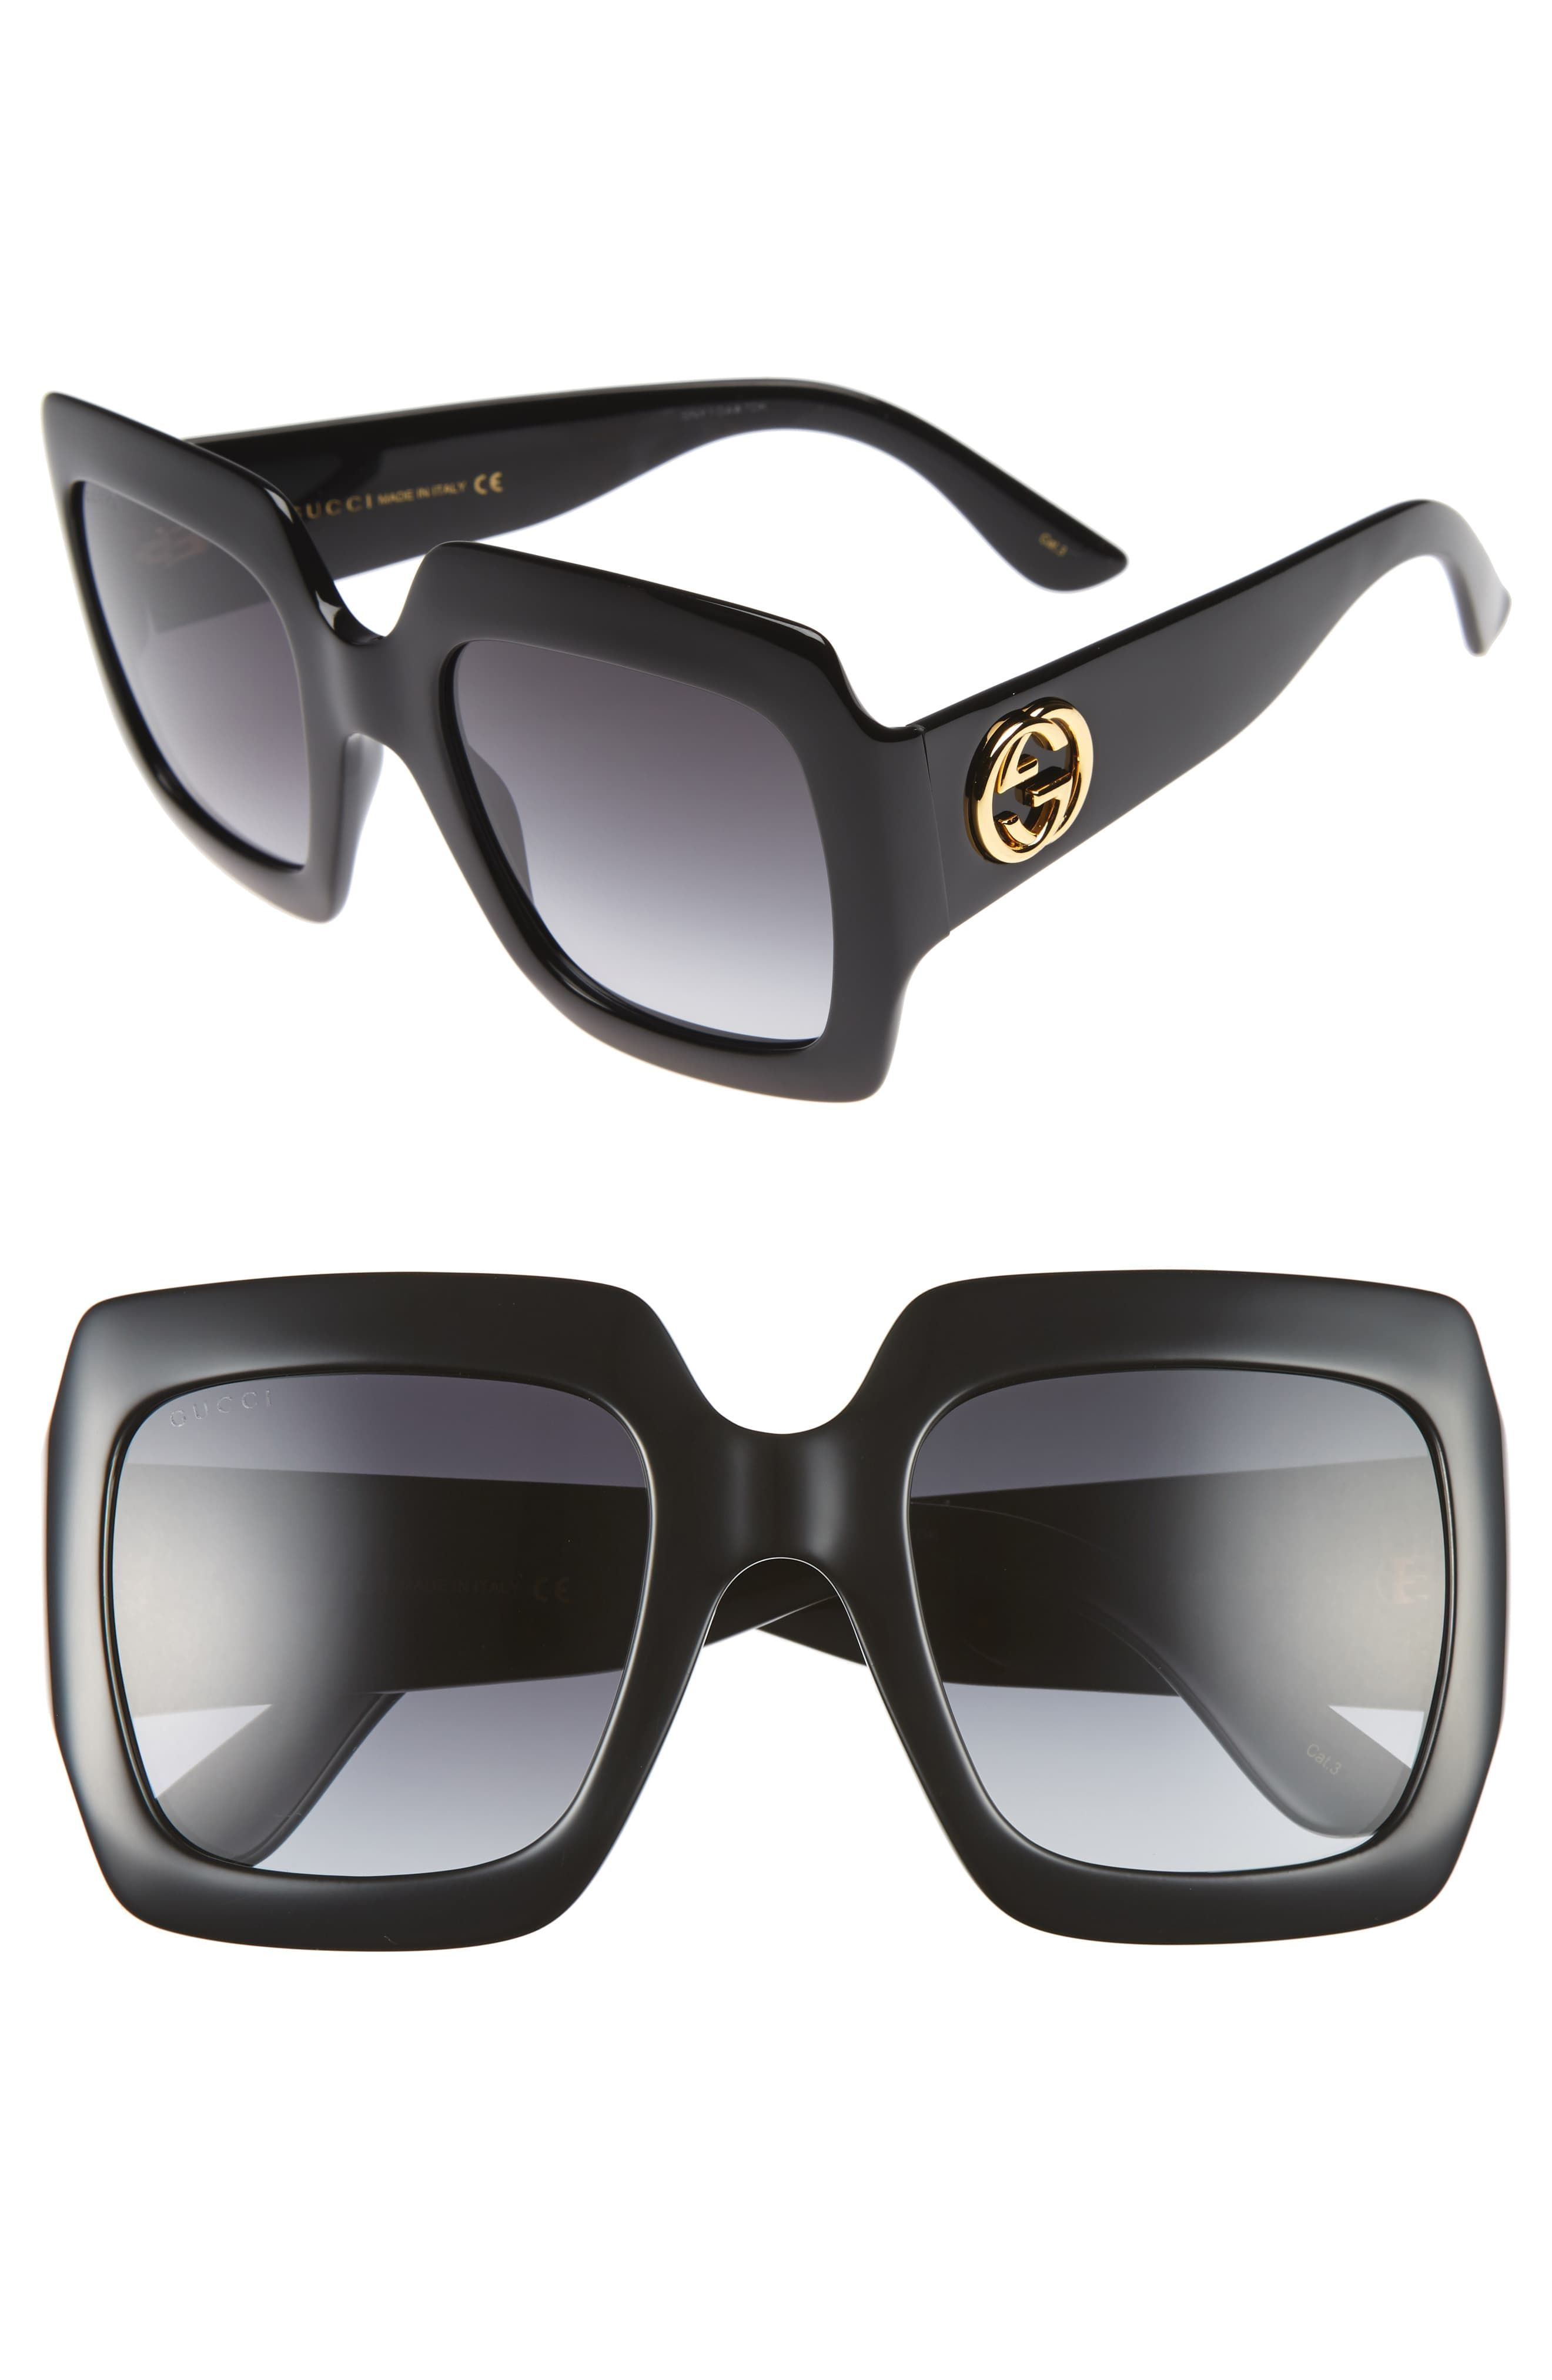 35ec1c7b9 Women's Gucci 54Mm Square Sunglasses - Black/ Grey in 2019 ...